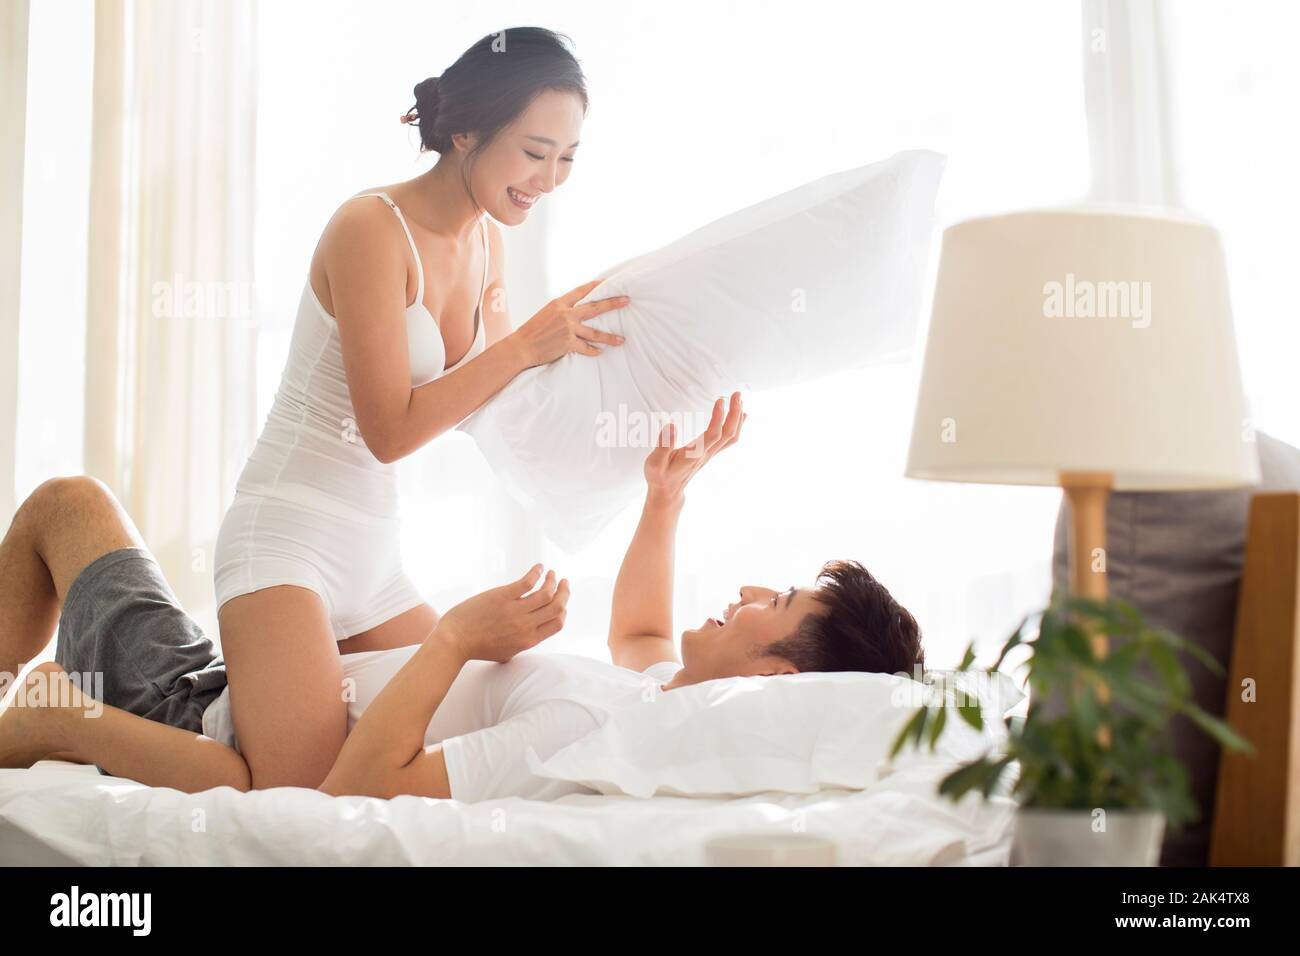 Chinese couple having fun